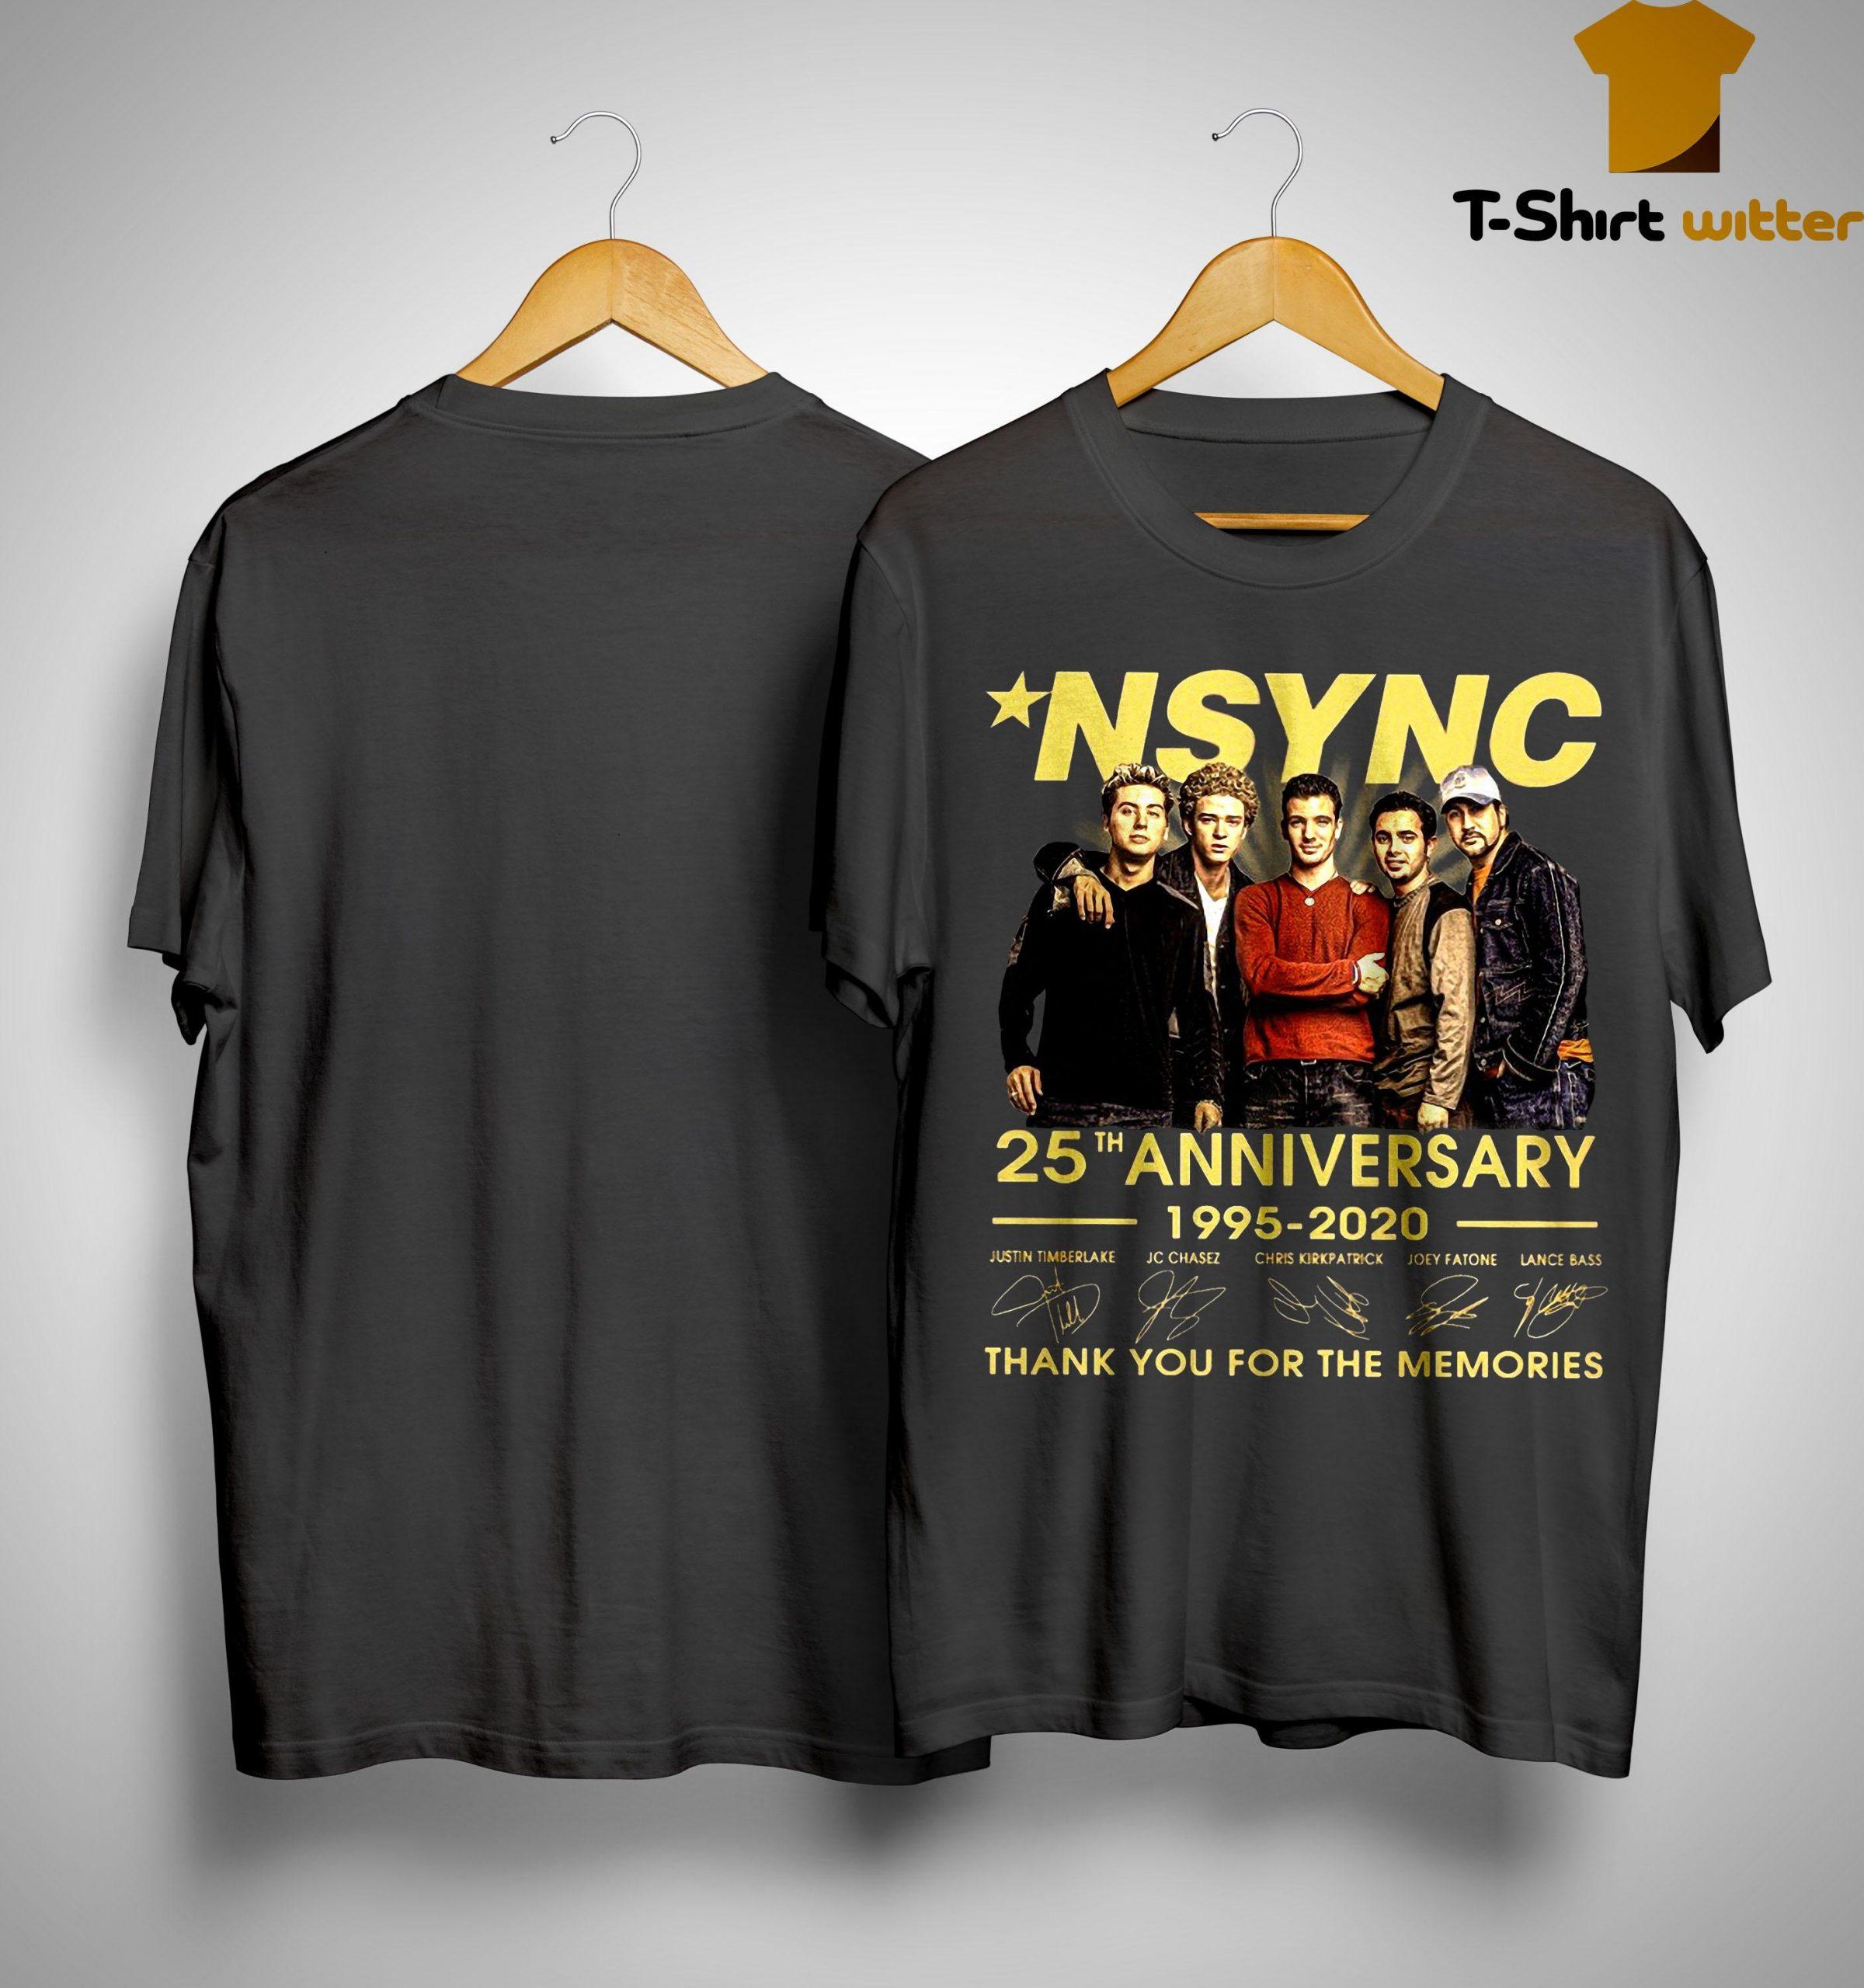 Nsync 25th Anniversary 1995 2020 Thank You For The Memories Shirt